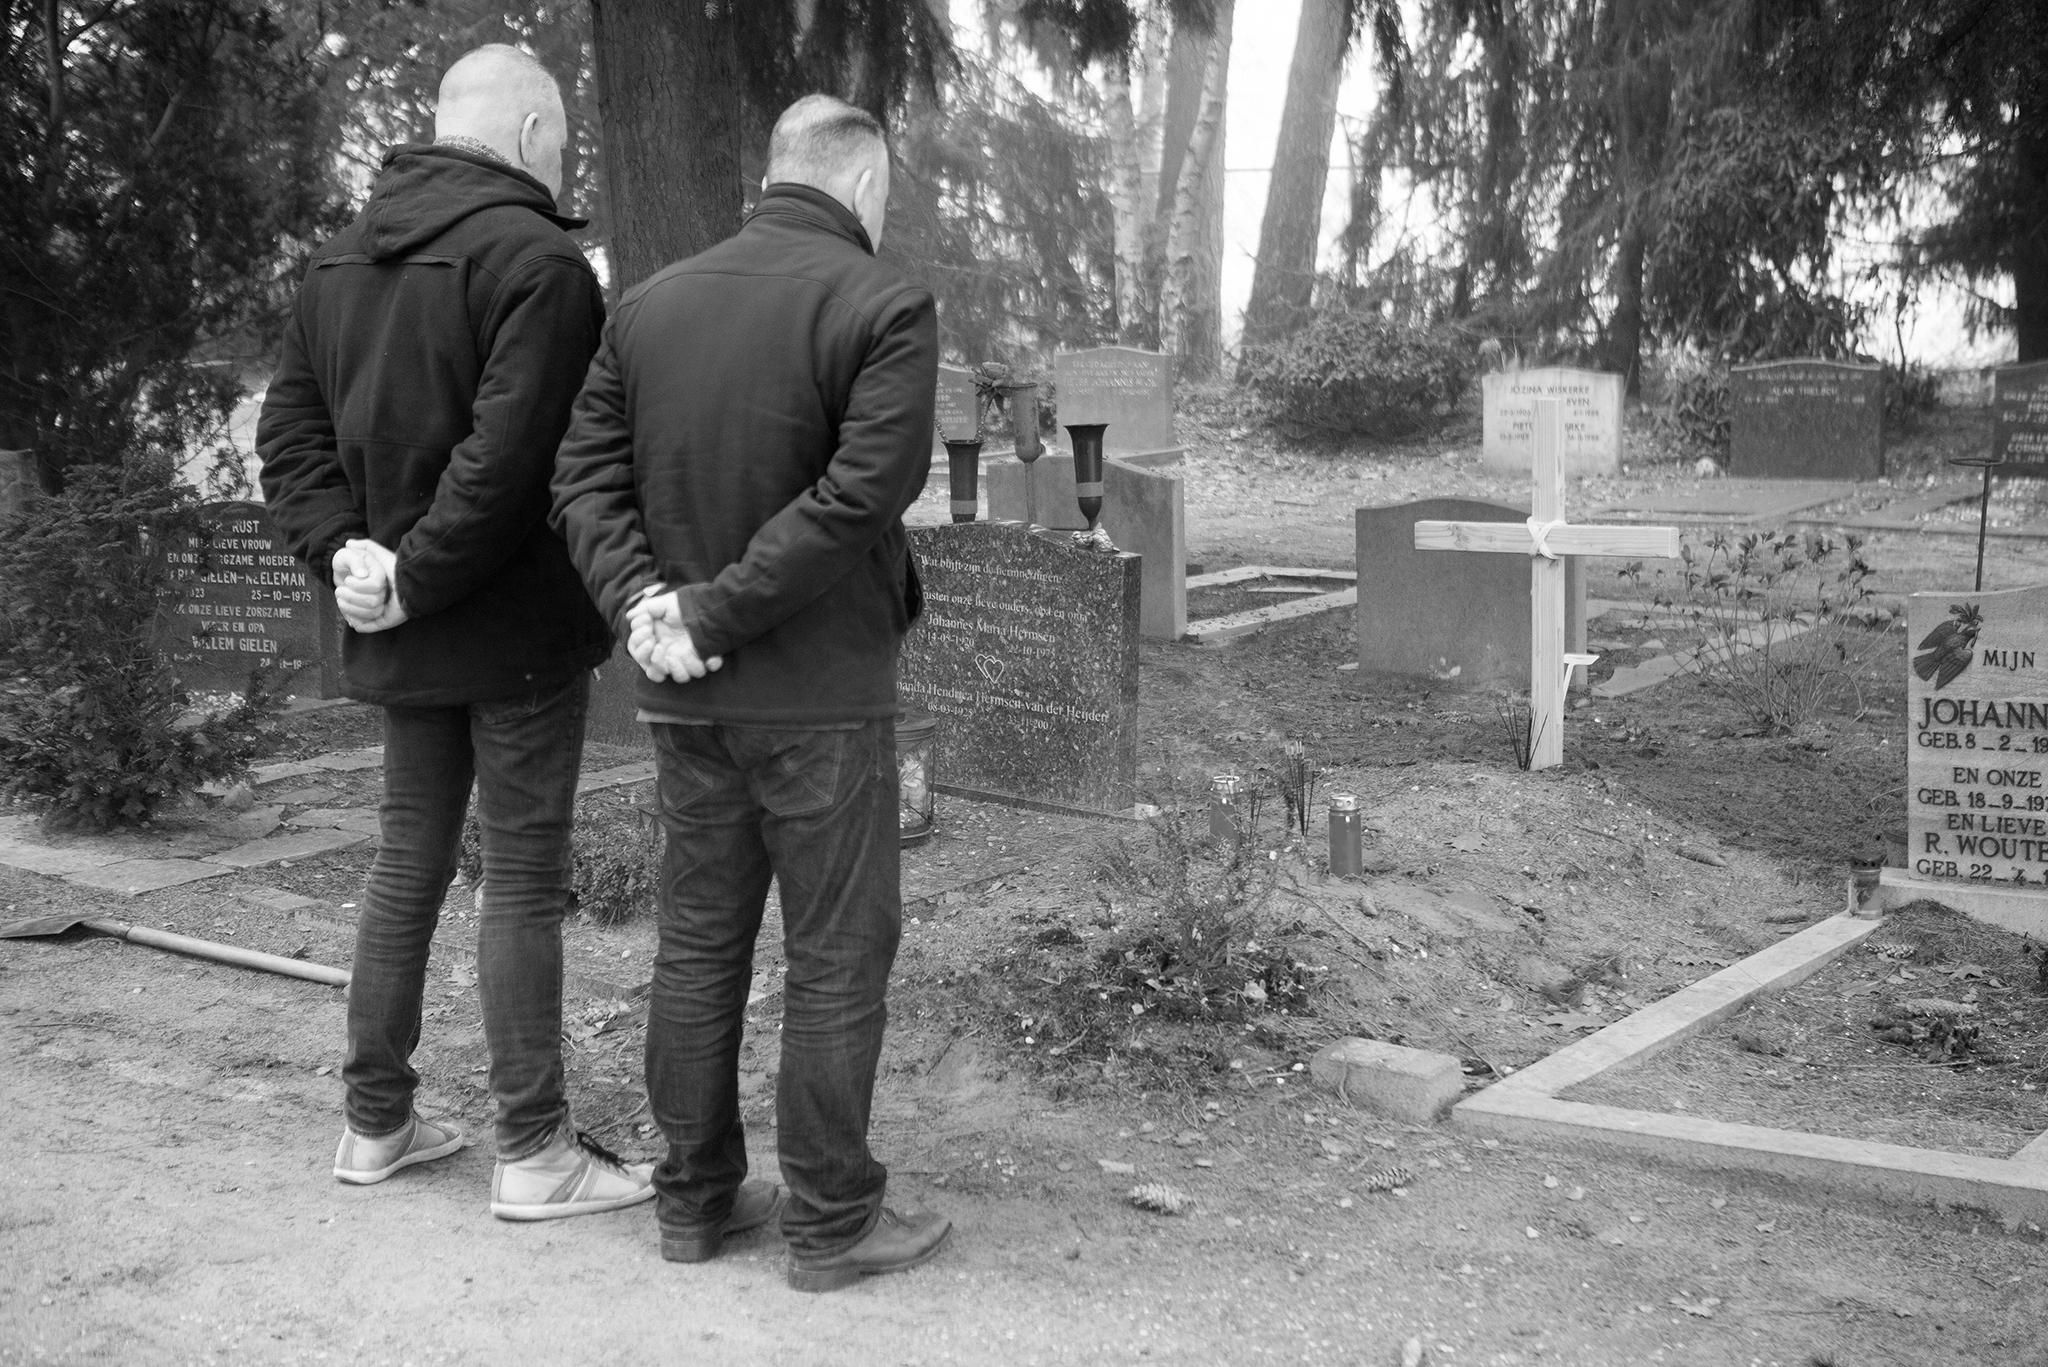 20161220-recherche-utrecht-plaatst-kruis-bij-onbekende-dode-man-2b